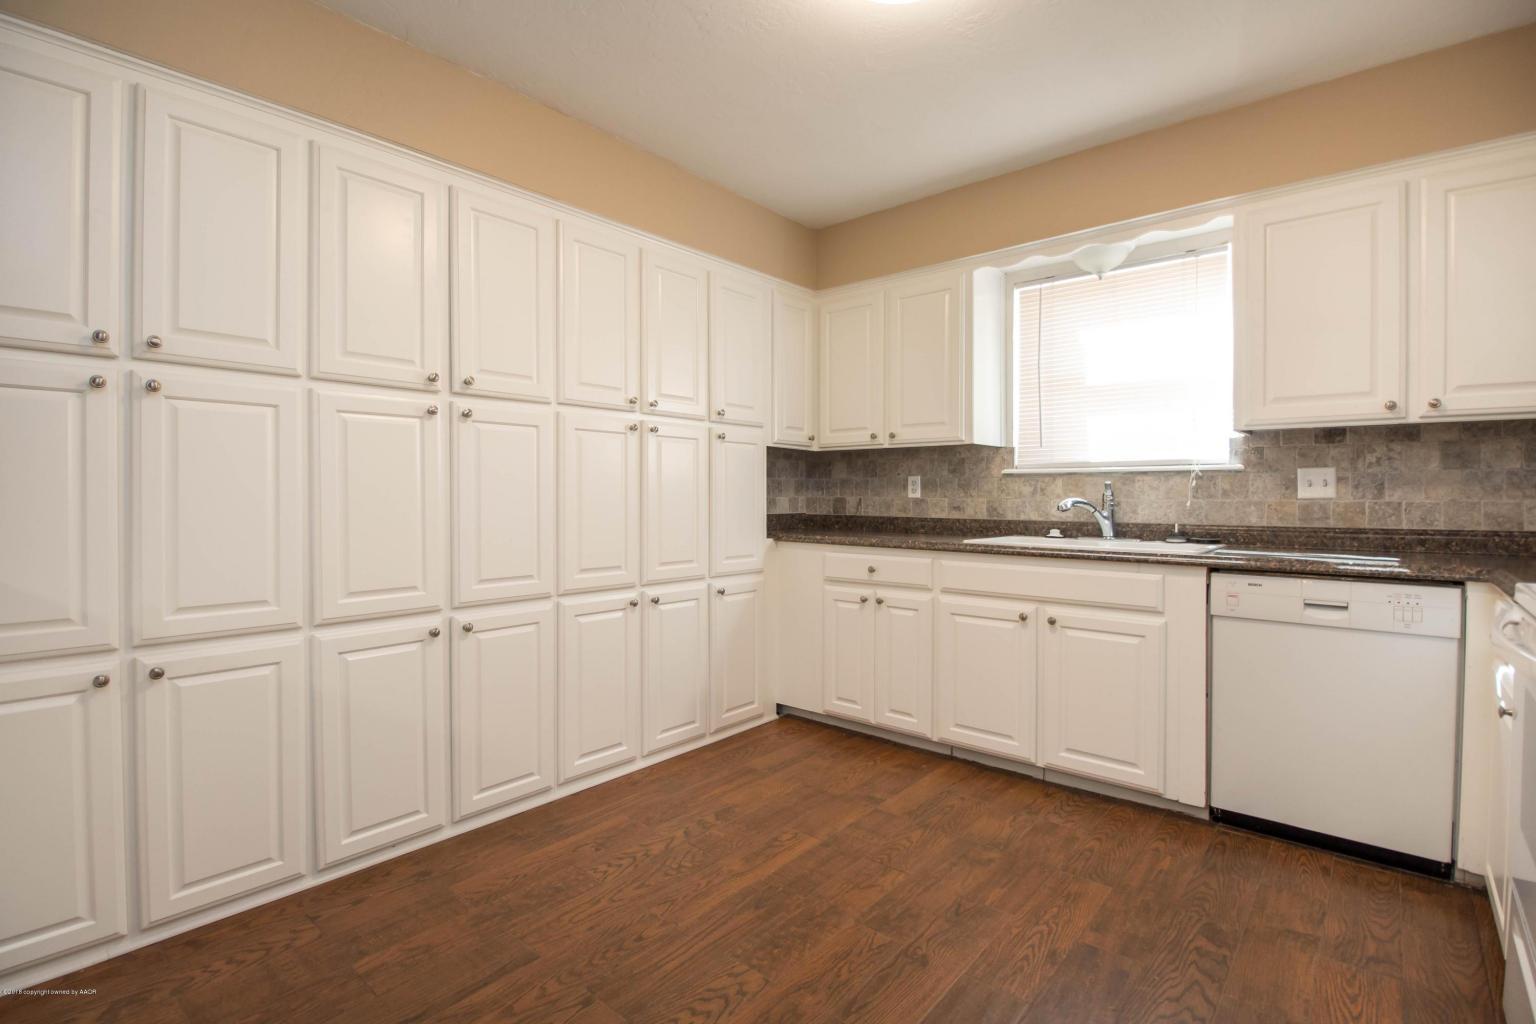 HOMESEARCHPLACE.COM - Find Realtors, Homes & Mortgage Lenders Near You